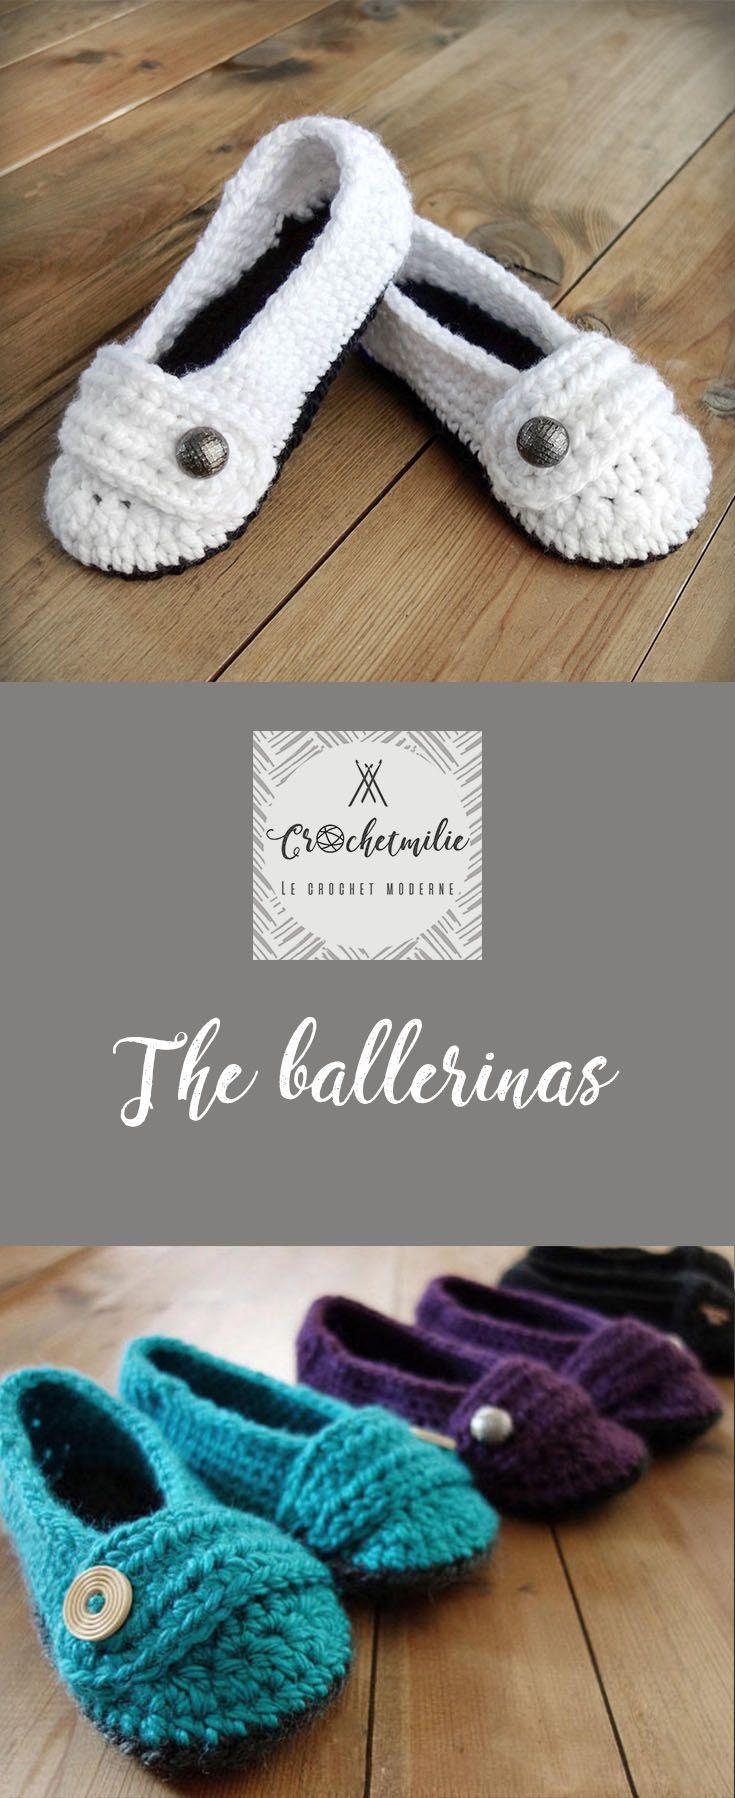 The ballerinas - Cute women slippers by CROCHETMILIE